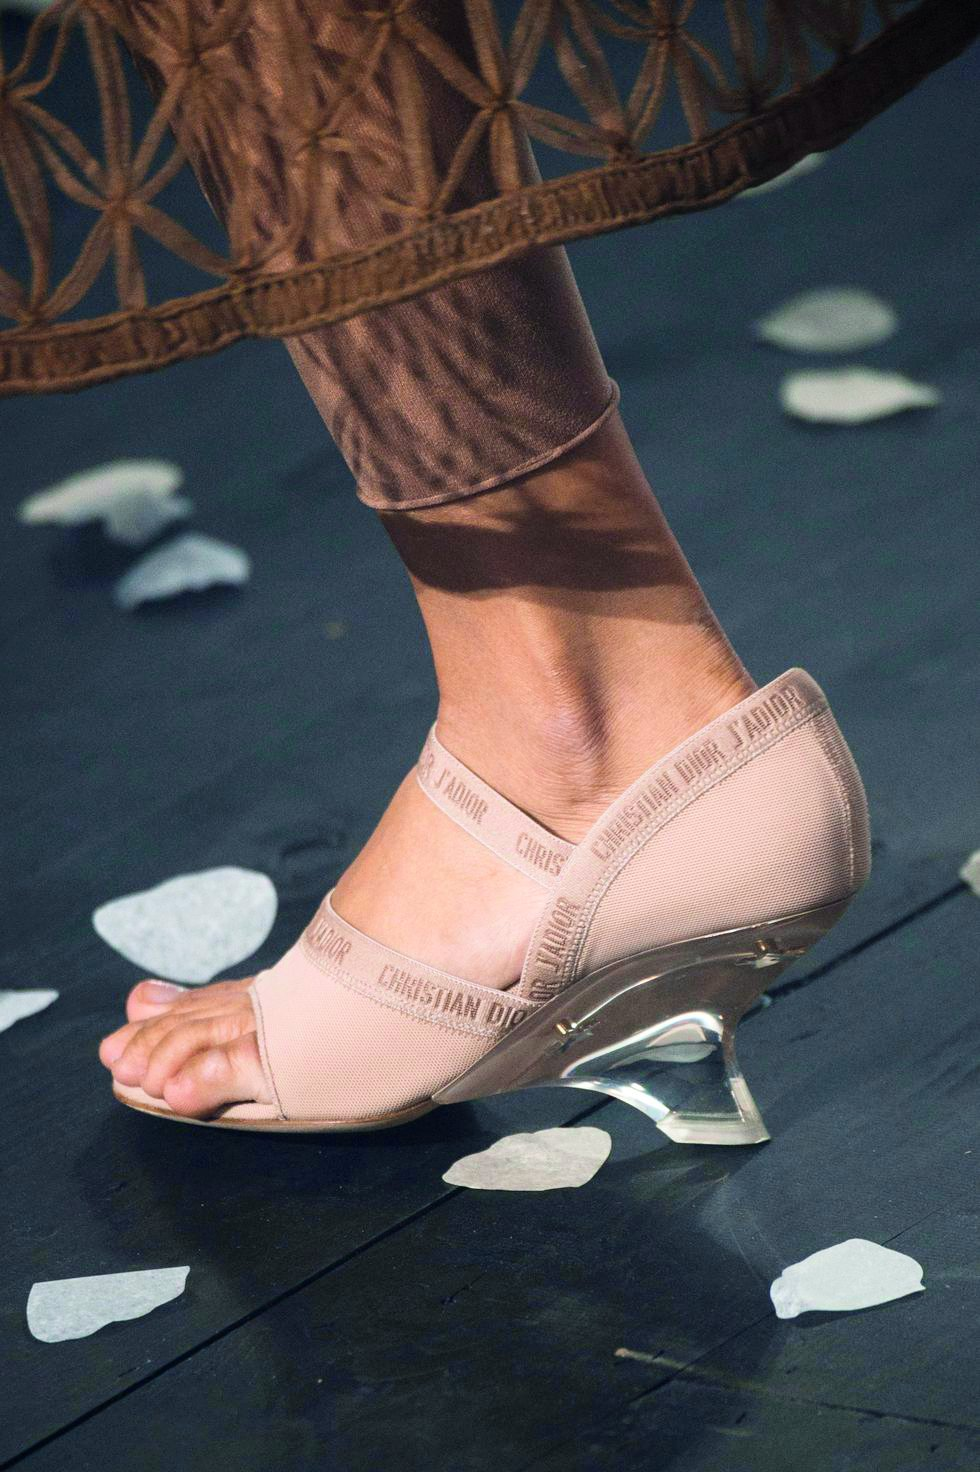 8d806c1a0 مجلة زهرة السوسن - الأشكال المبتكرة لكعب الحذاء... ستجعلكِ مواكبة ...